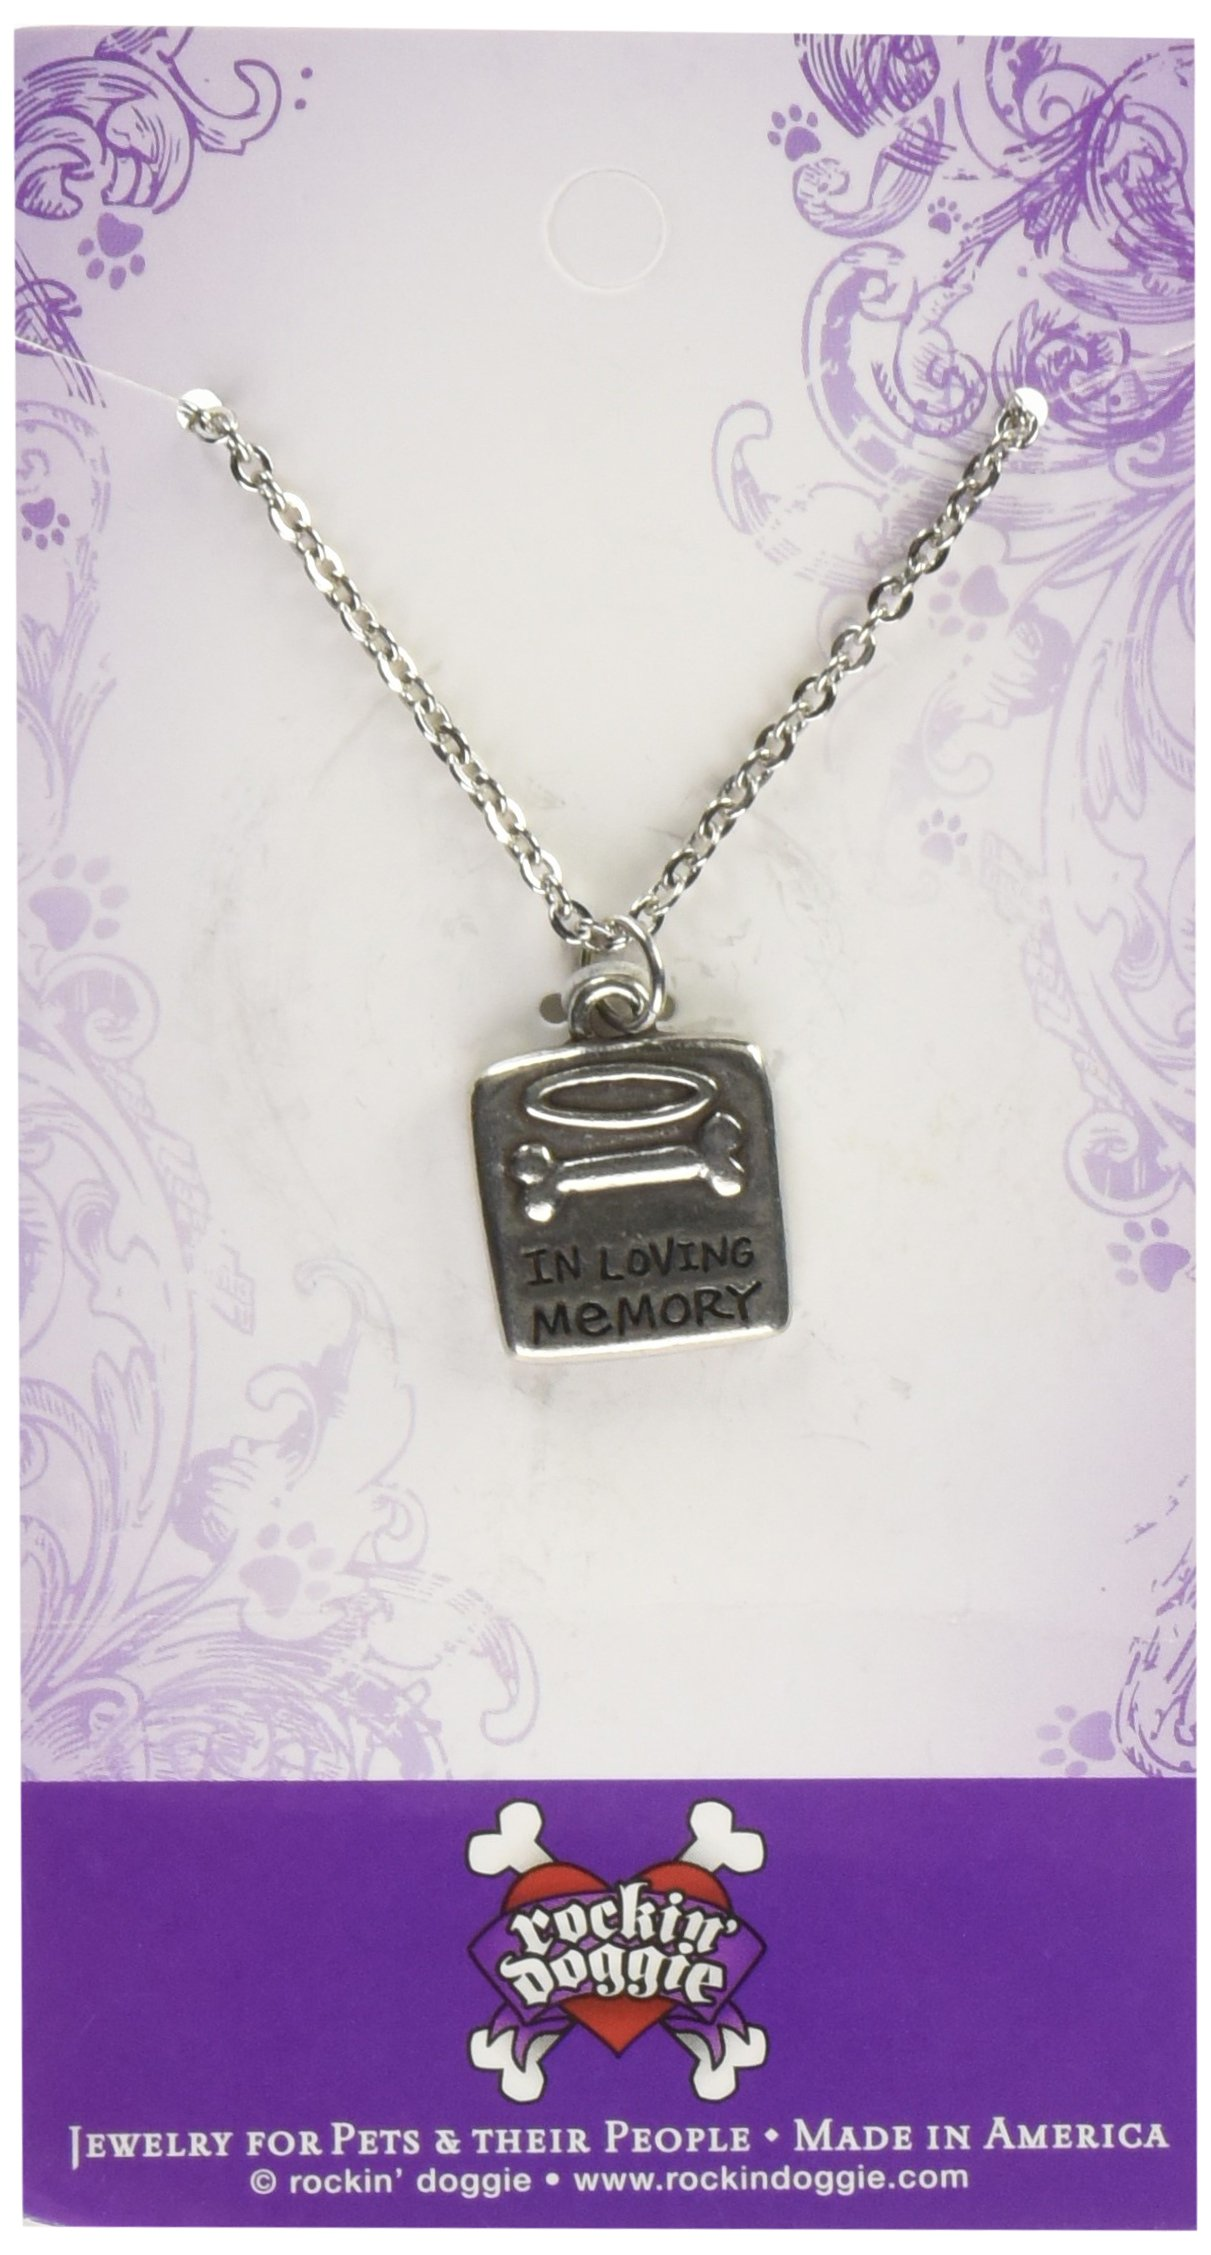 Rockin Doggie Pewter Memorial Necklace, In Loving Memory